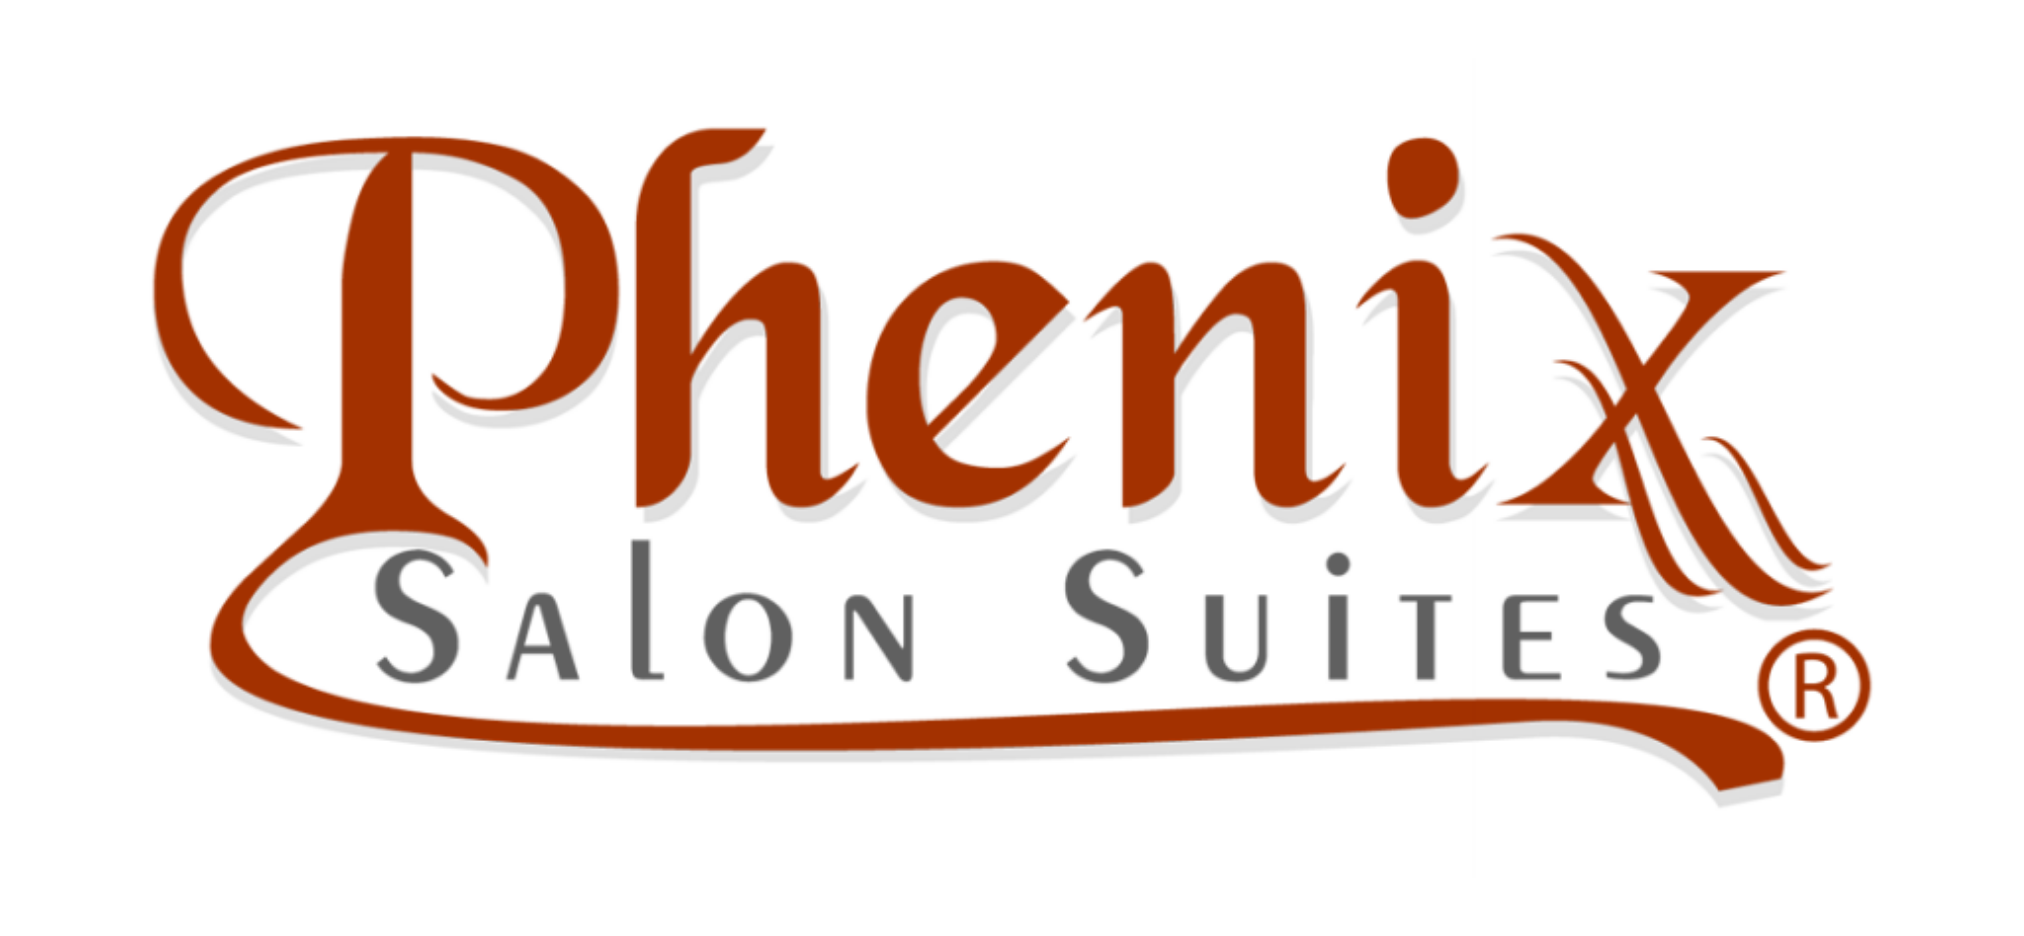 PhenixSalonSuD45cR04aP01ZL.psd.png